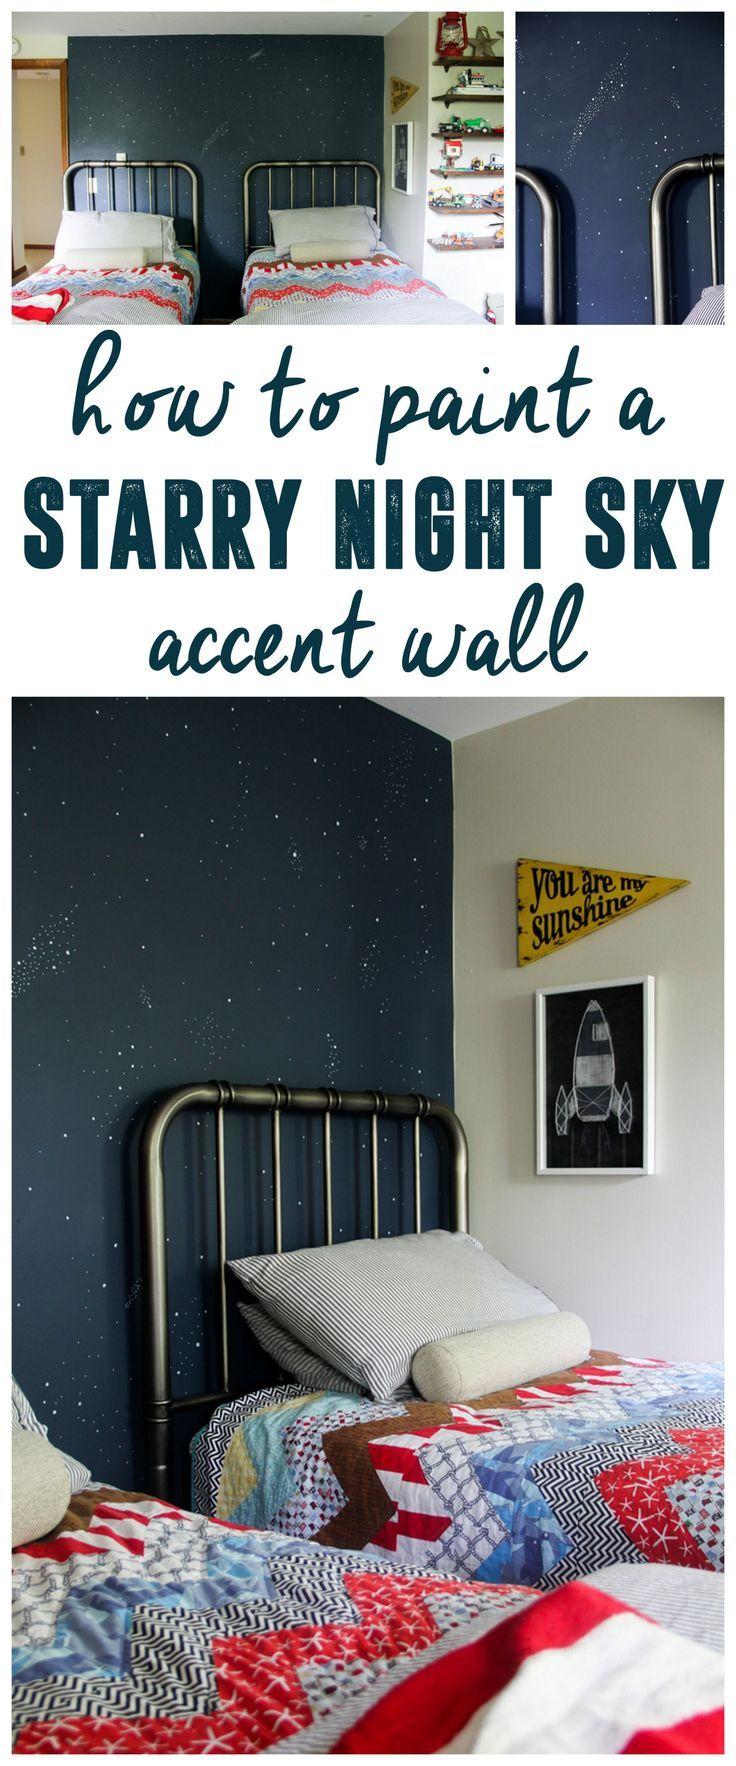 Night Sky Accent Wall, Starry Sky Mural, Star Accent Wall www.BrightGreenDoor.com